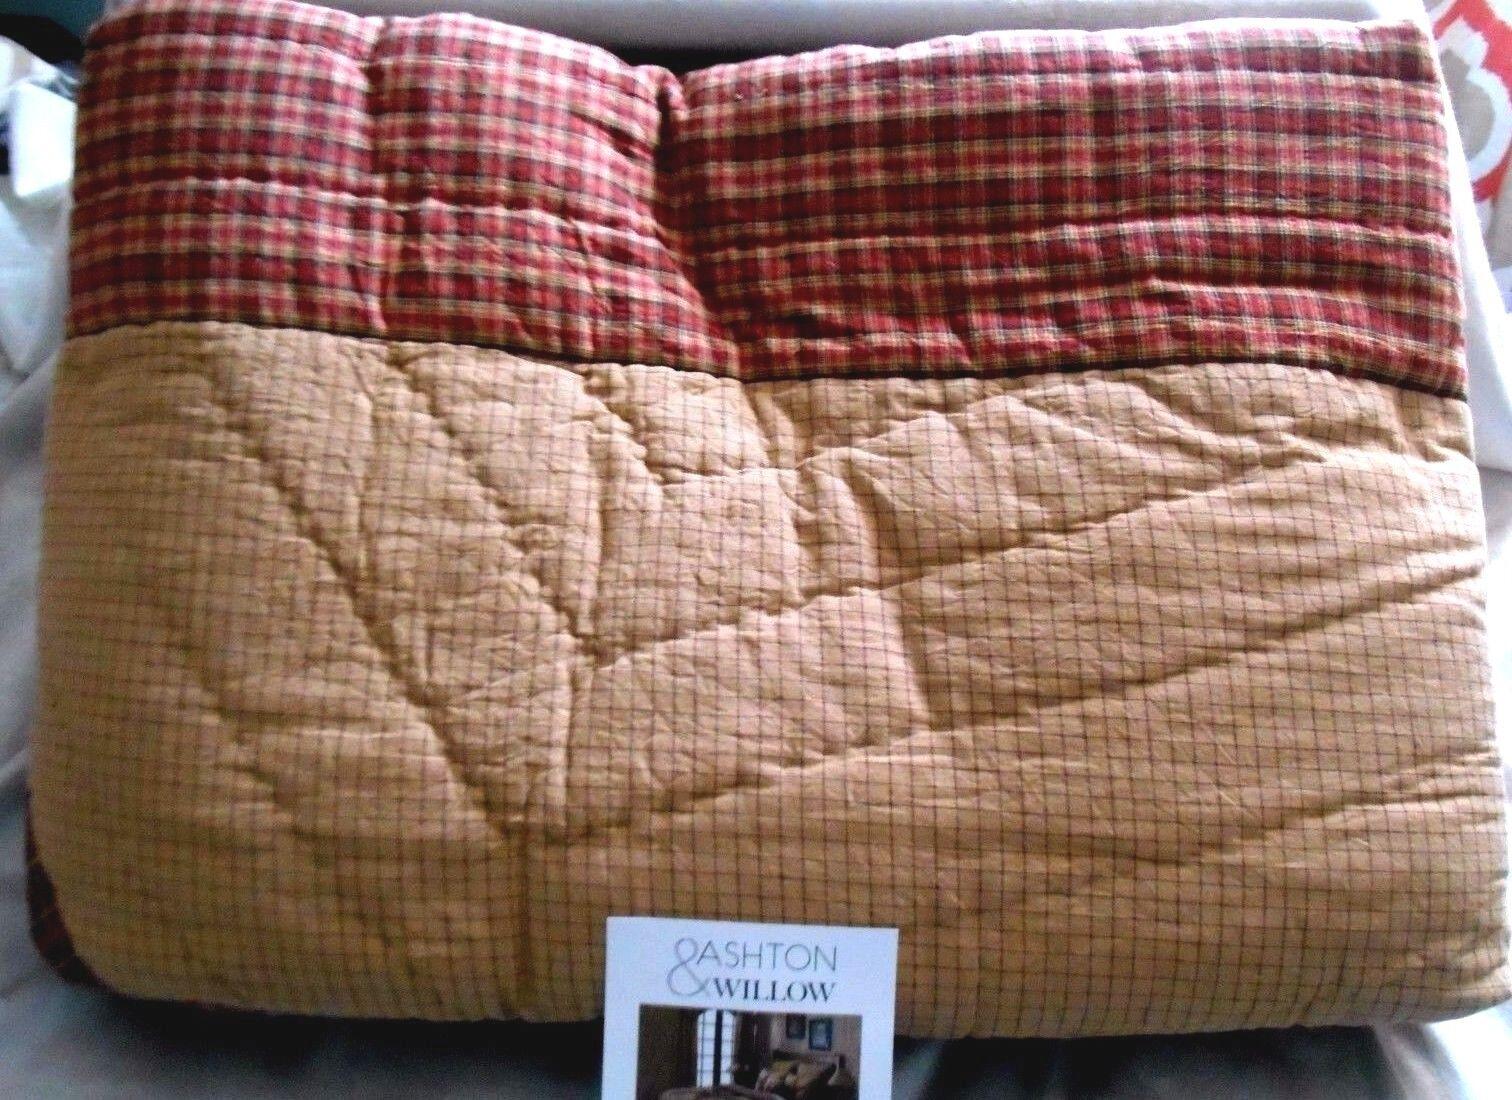 NEW Ashton & Willow Landon Plaid Star Country Design 100% Cotton KING QUILT